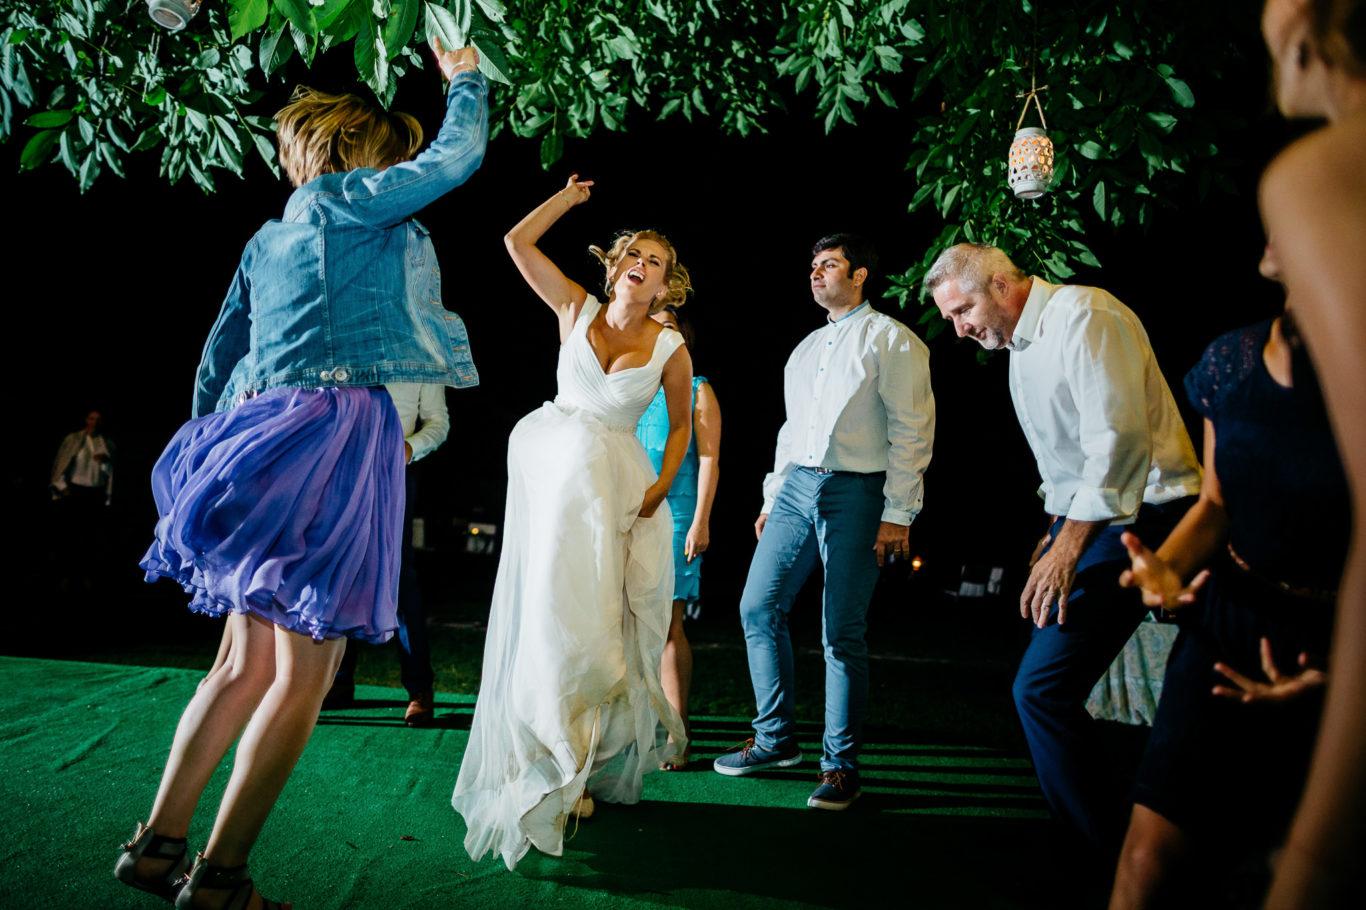 0833-fotoreportaj-nunta-conacul-maldar-cristina-stefan-fotograf-ciprian-dumitrescu-dc1_3384